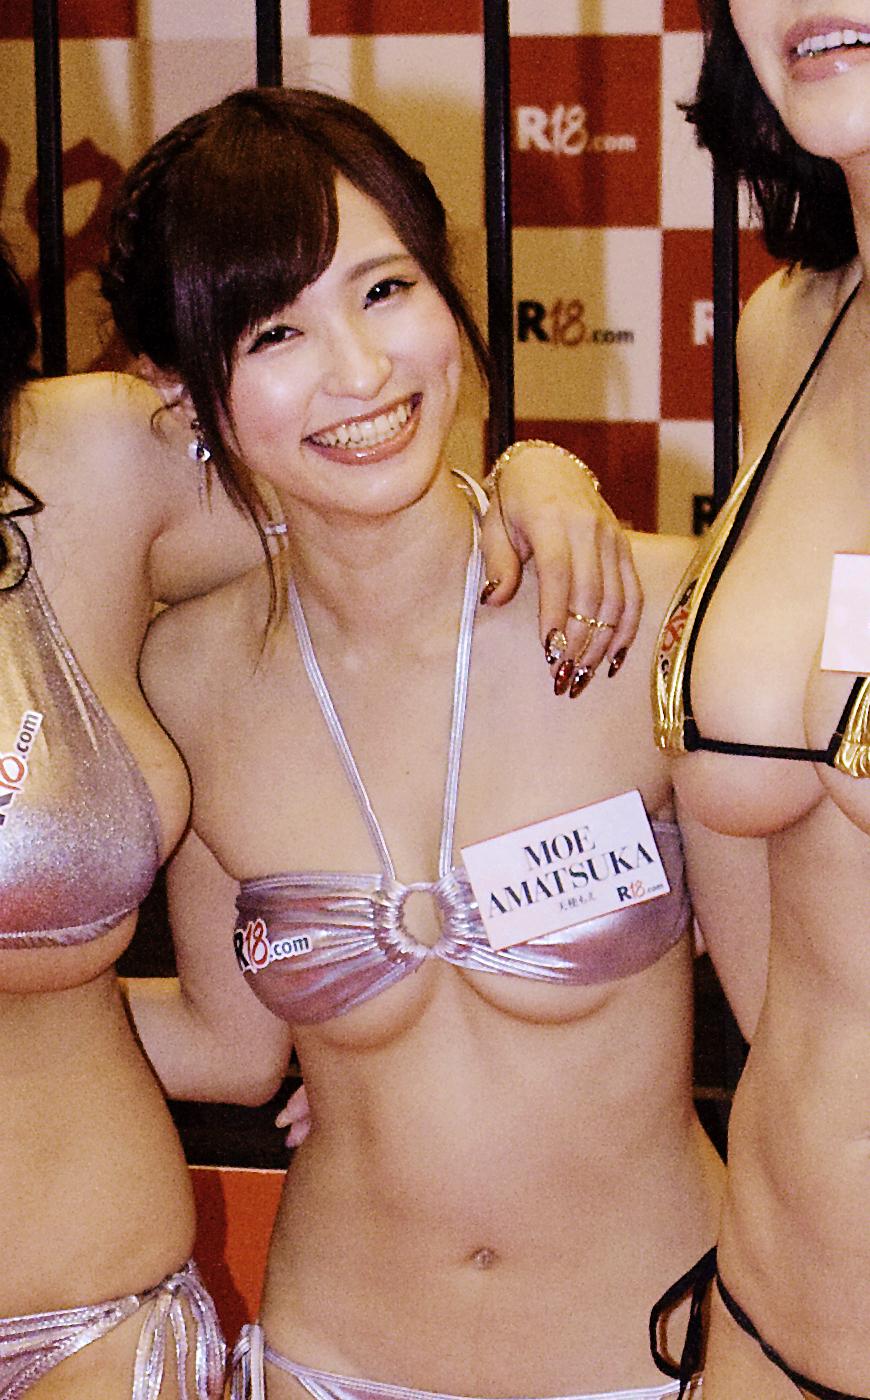 File Amatsuka Moe Japanese Porn Actress Wikimedia Commons